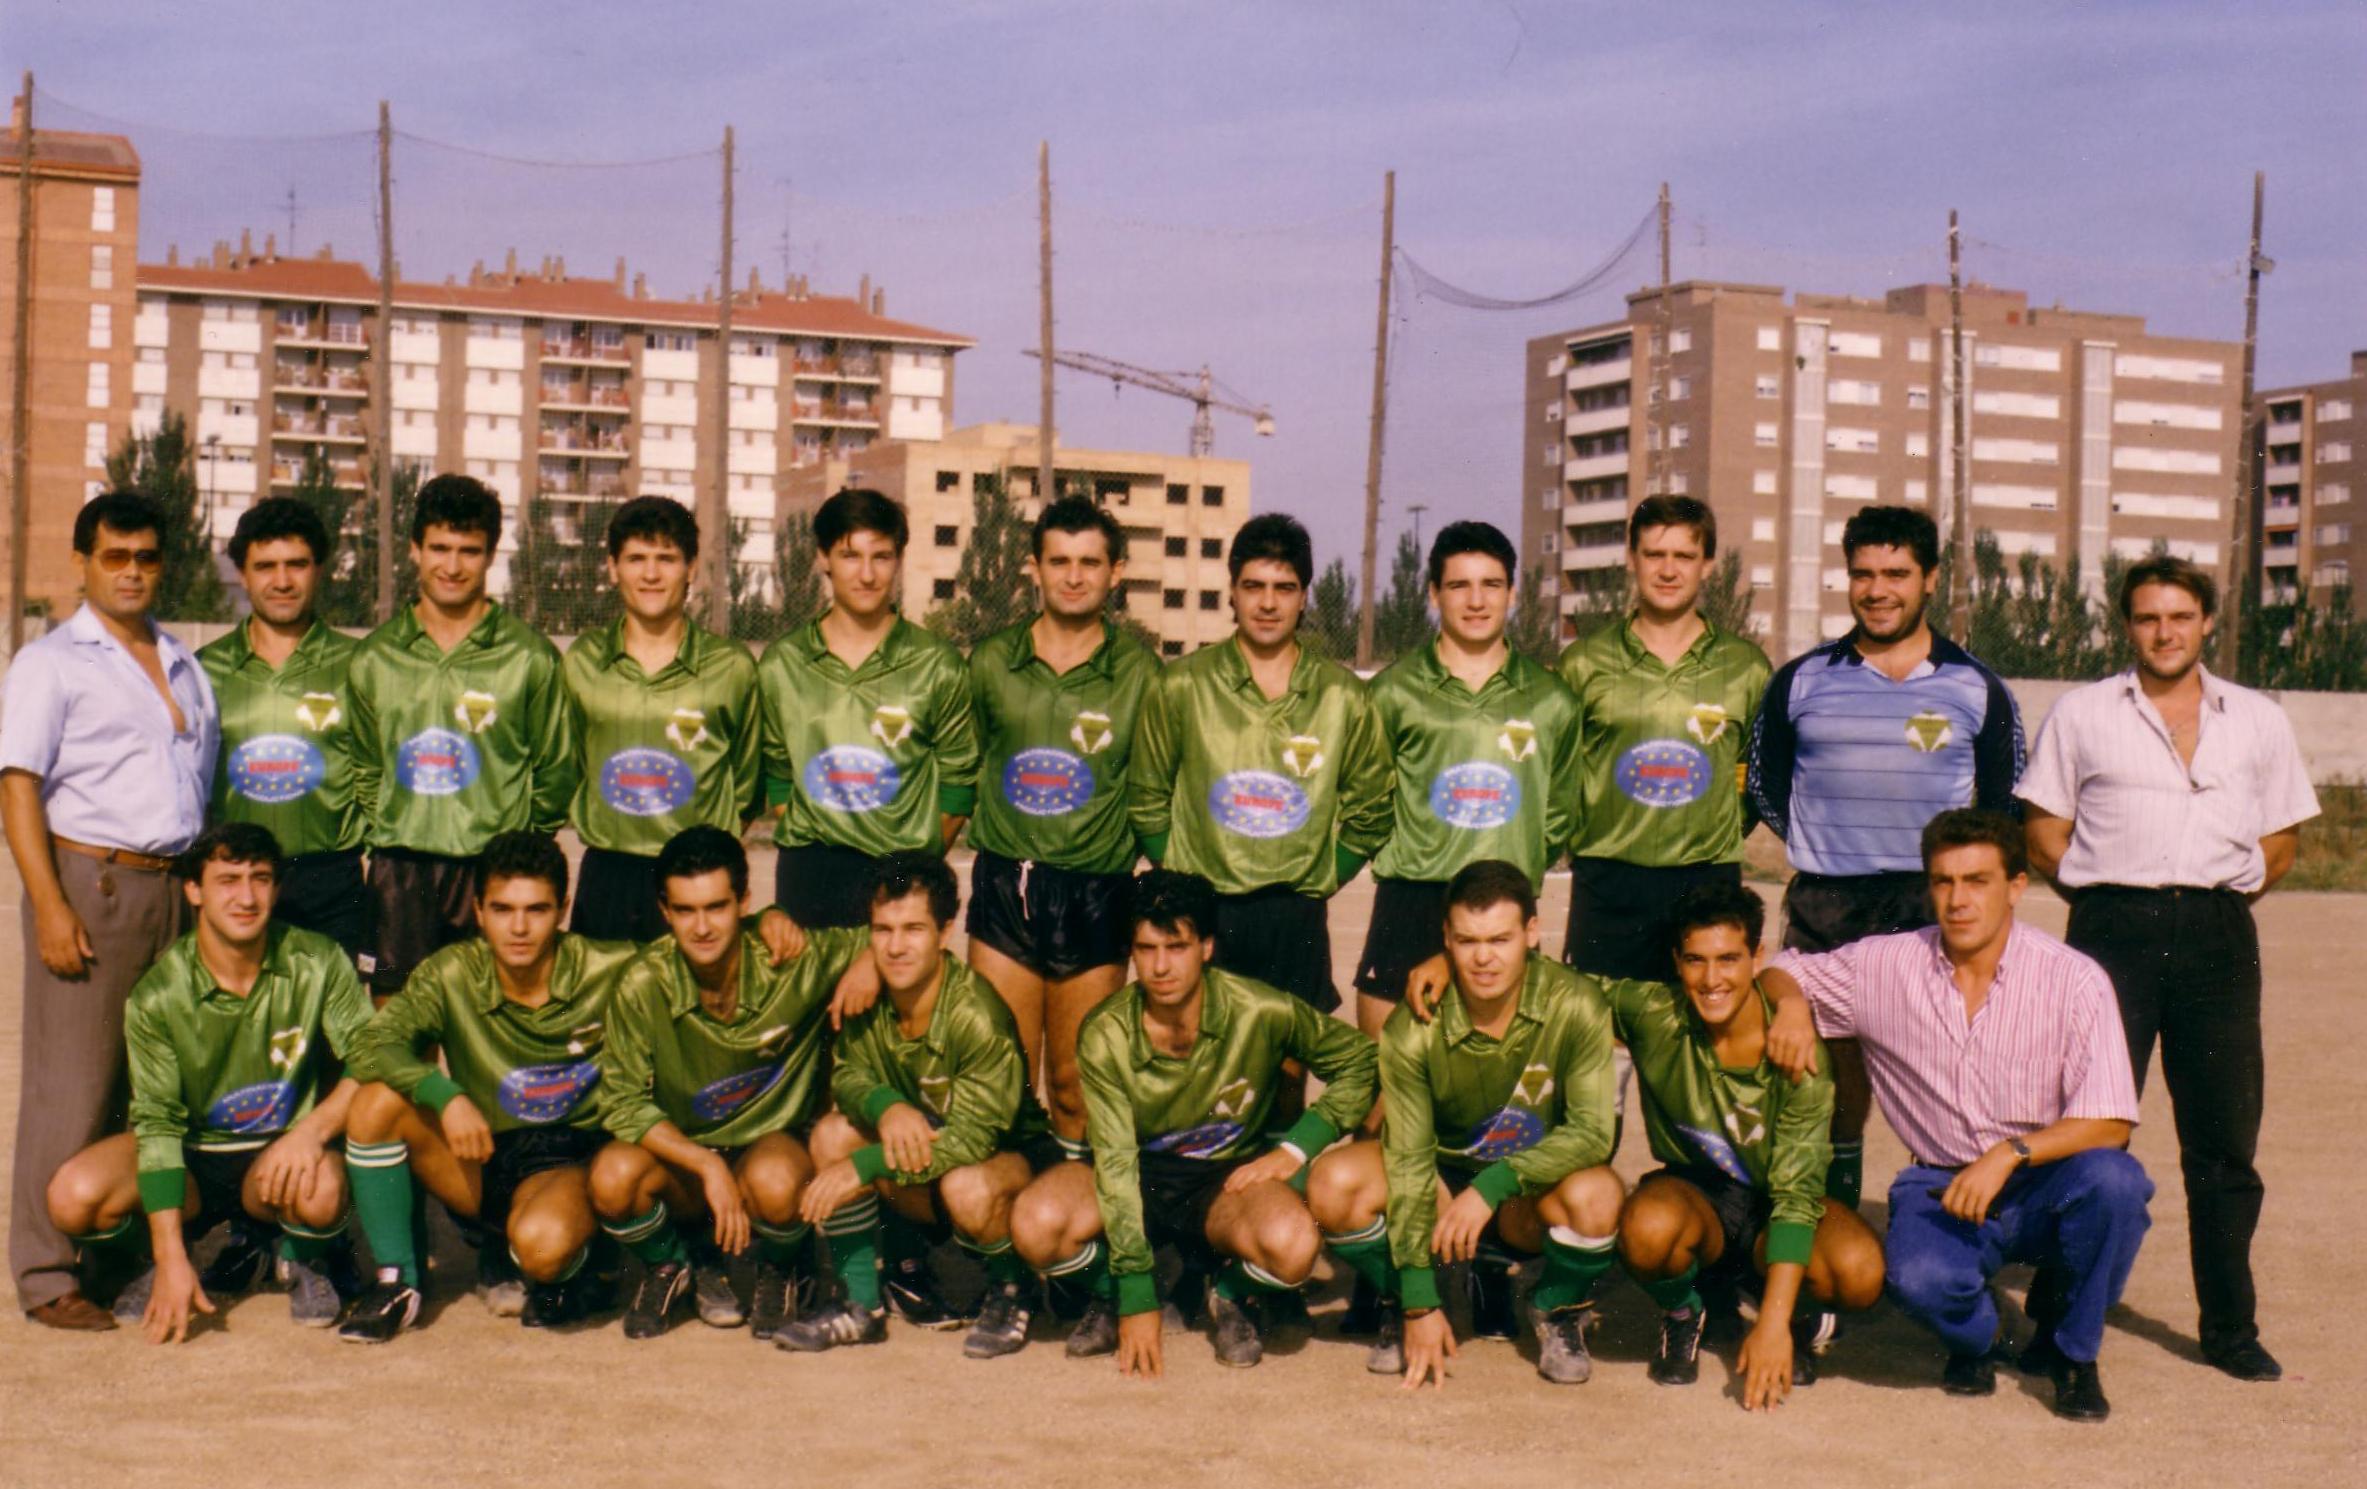 1991-1992 Regional